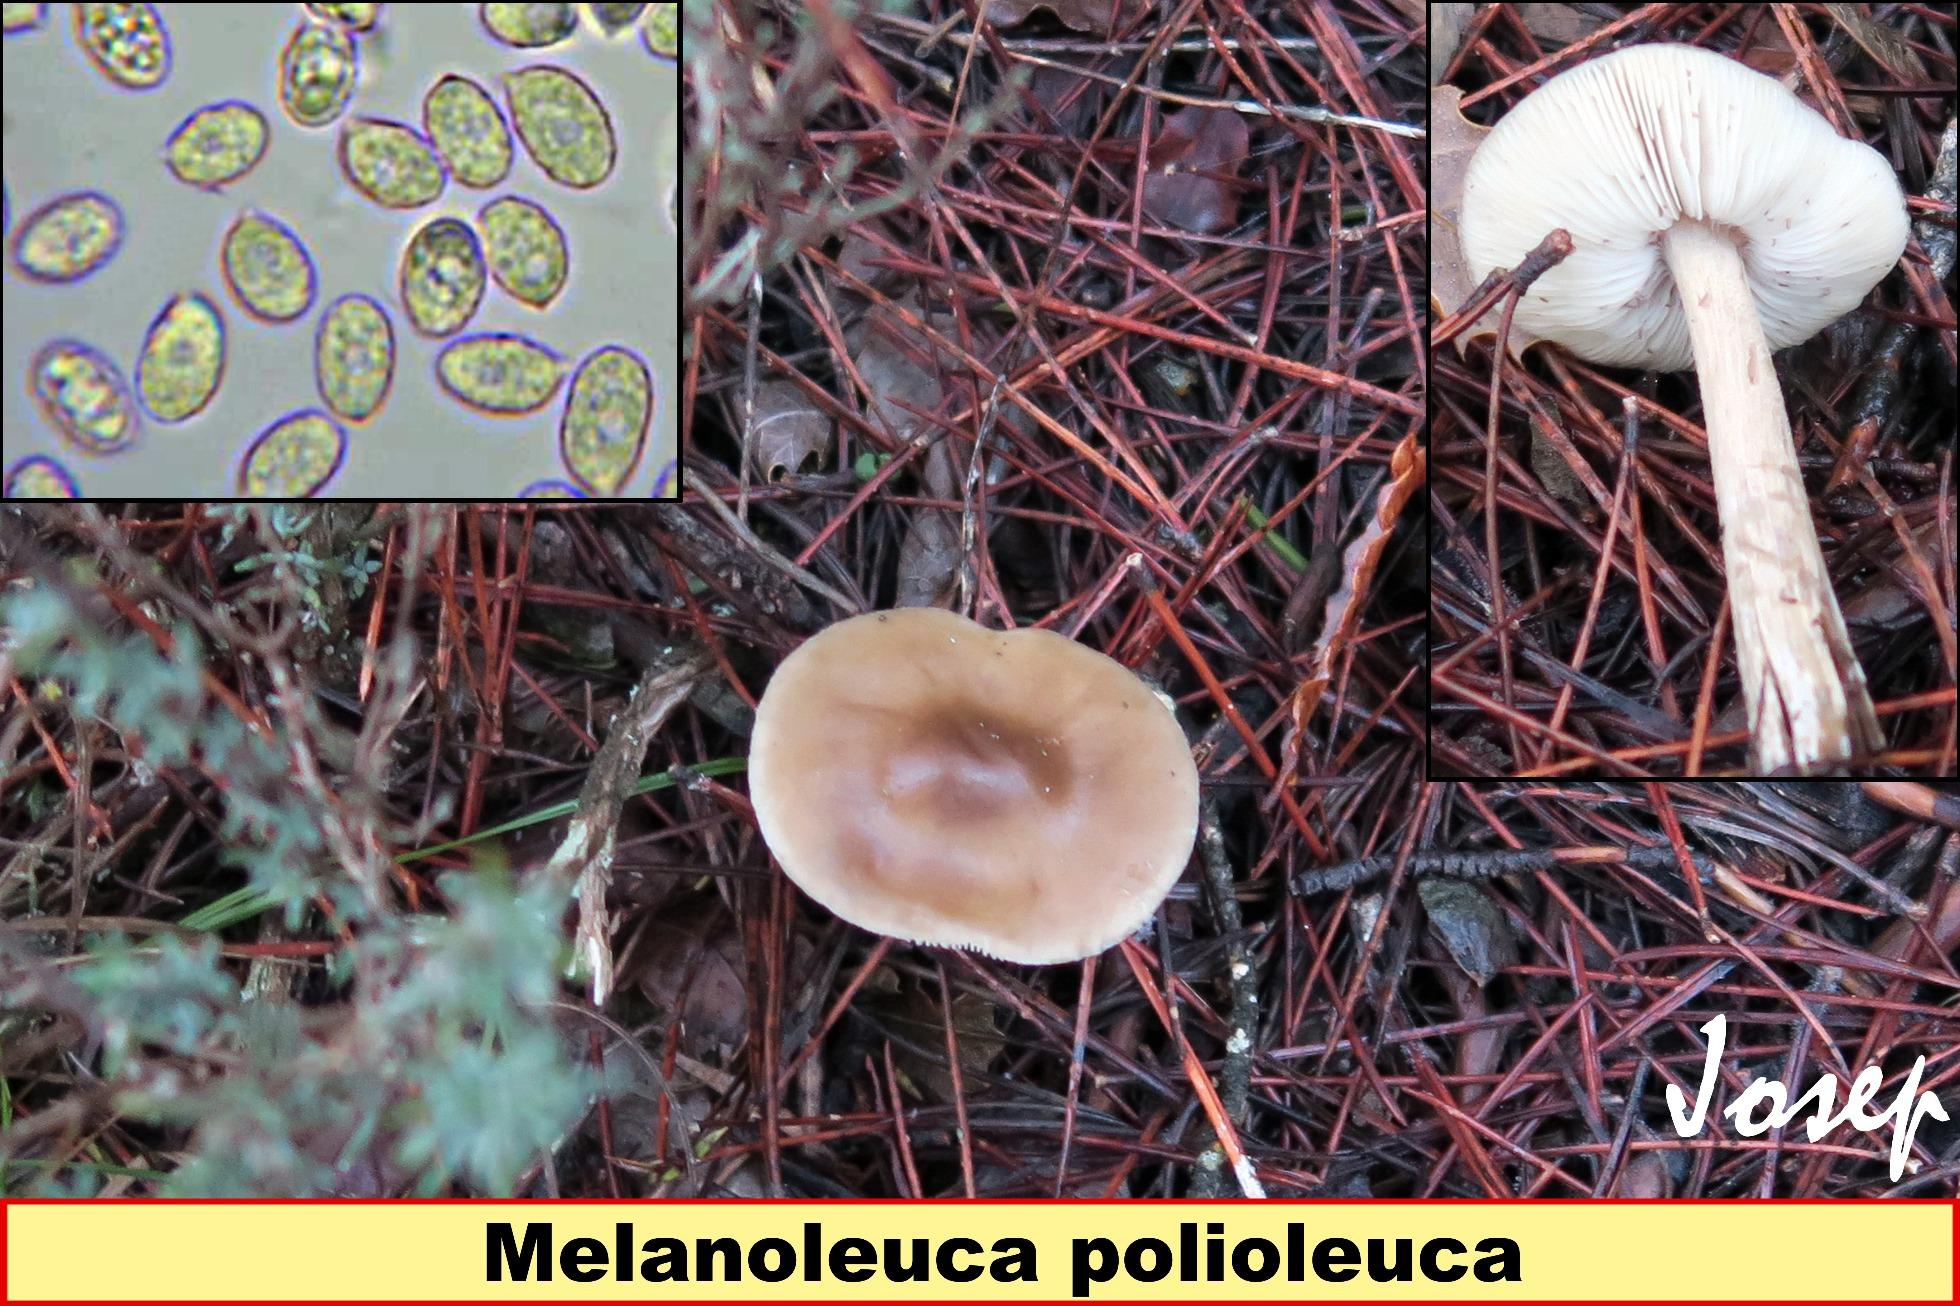 Melanoleucapolioleuca_2018-04-16.jpg